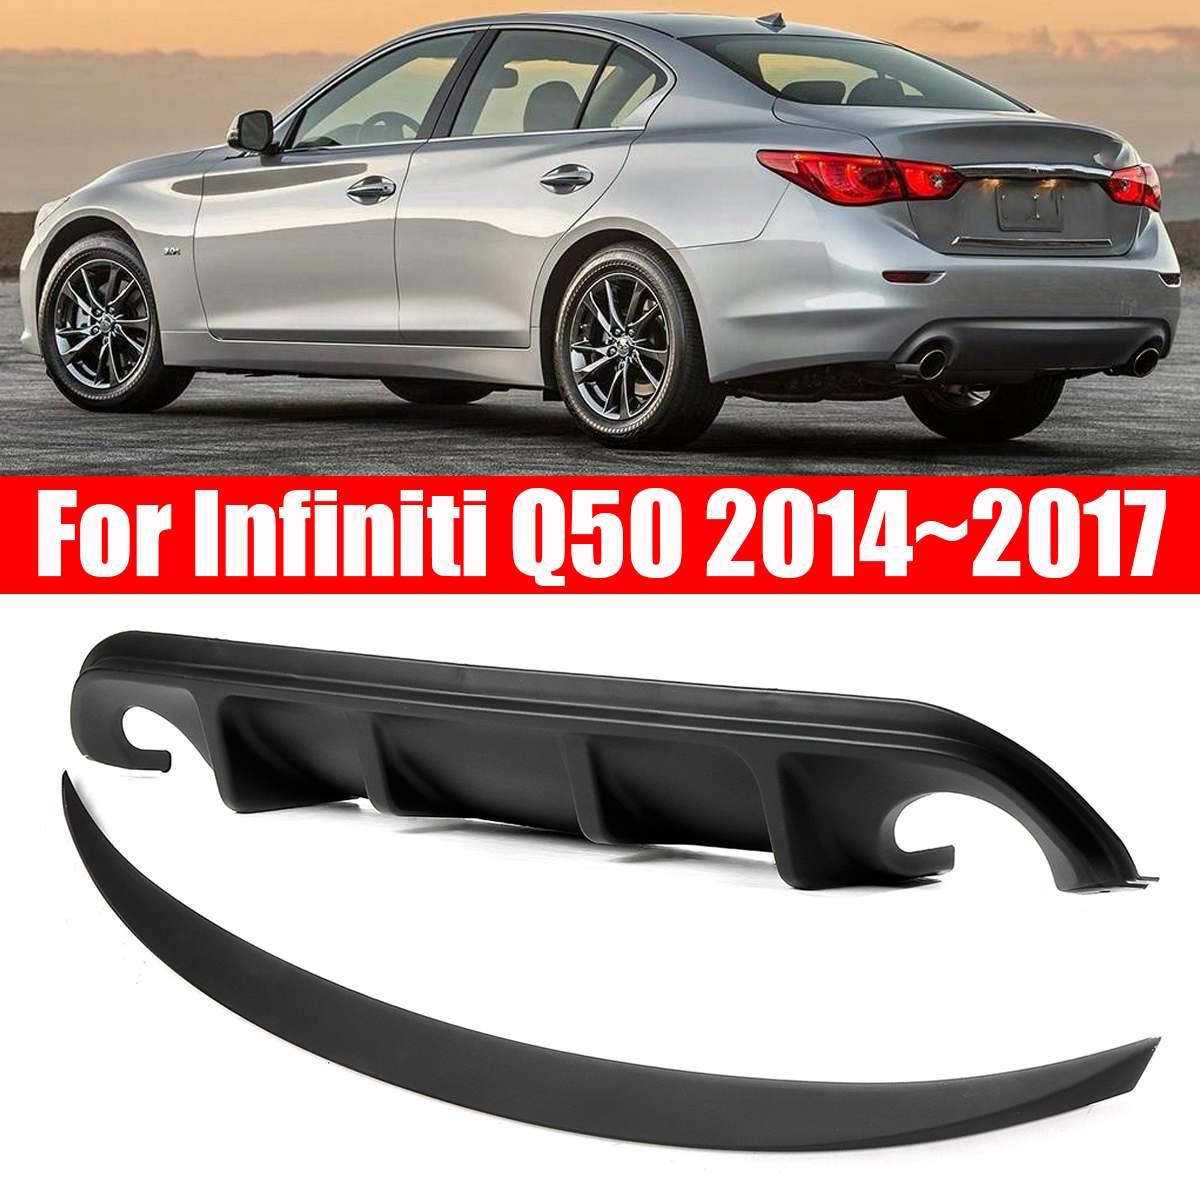 Otomobiller ve Motosikletler'ten Tamponlar'de 2 adet AQ tarzı arka tampon difüzör JDM stil bagaj Spoiler Infiniti Q50 2014 ~ 2017 title=